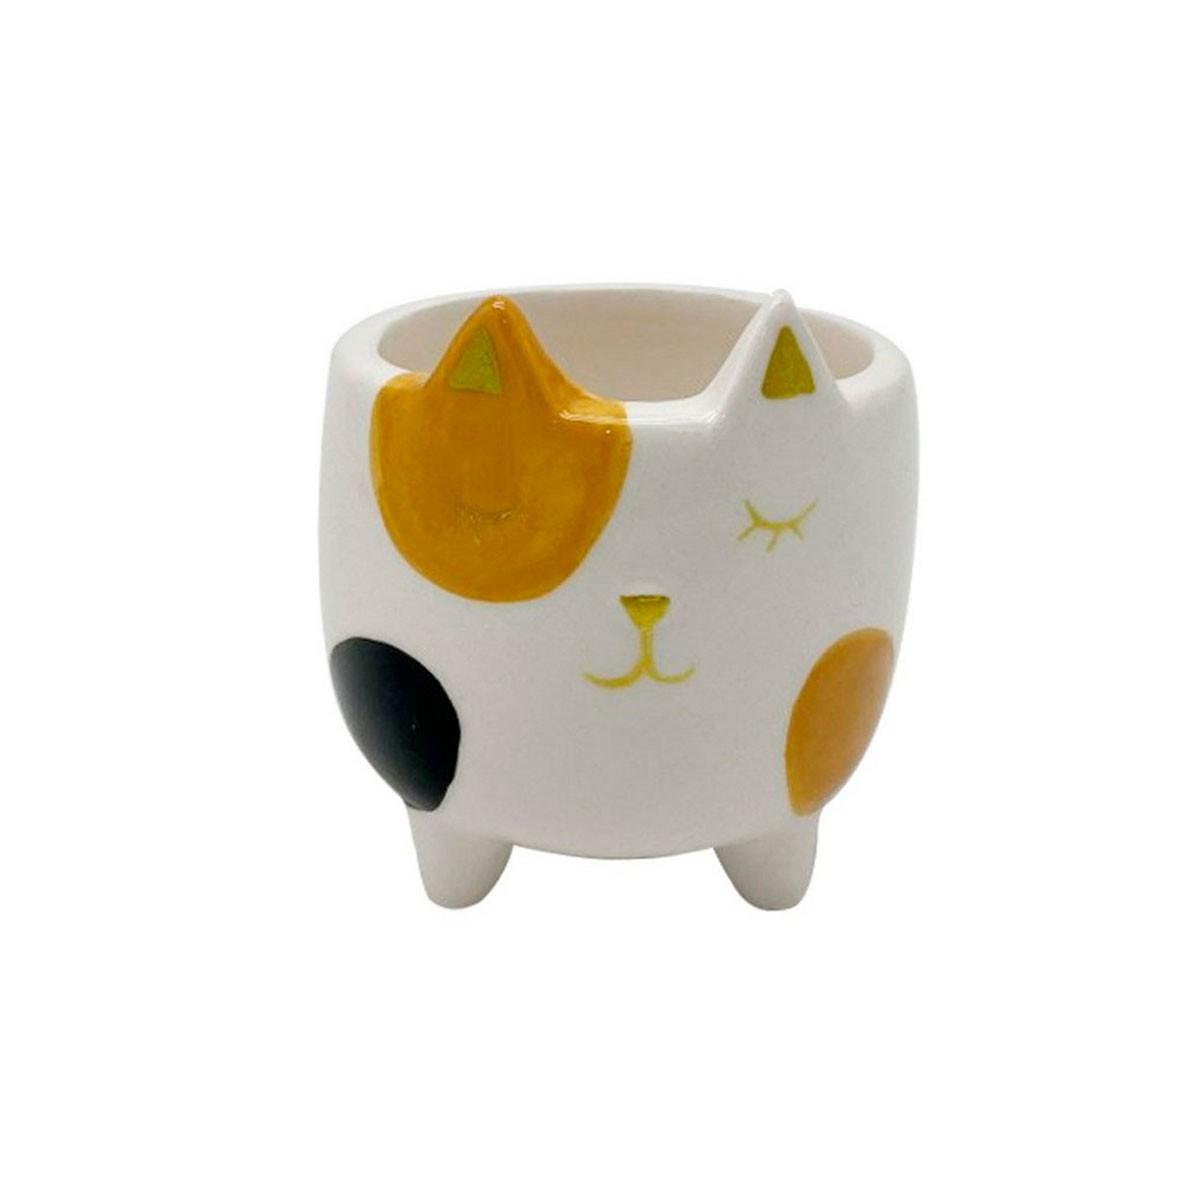 Cachepot Vaso Decorativo de Cerâmica Gato Malhado